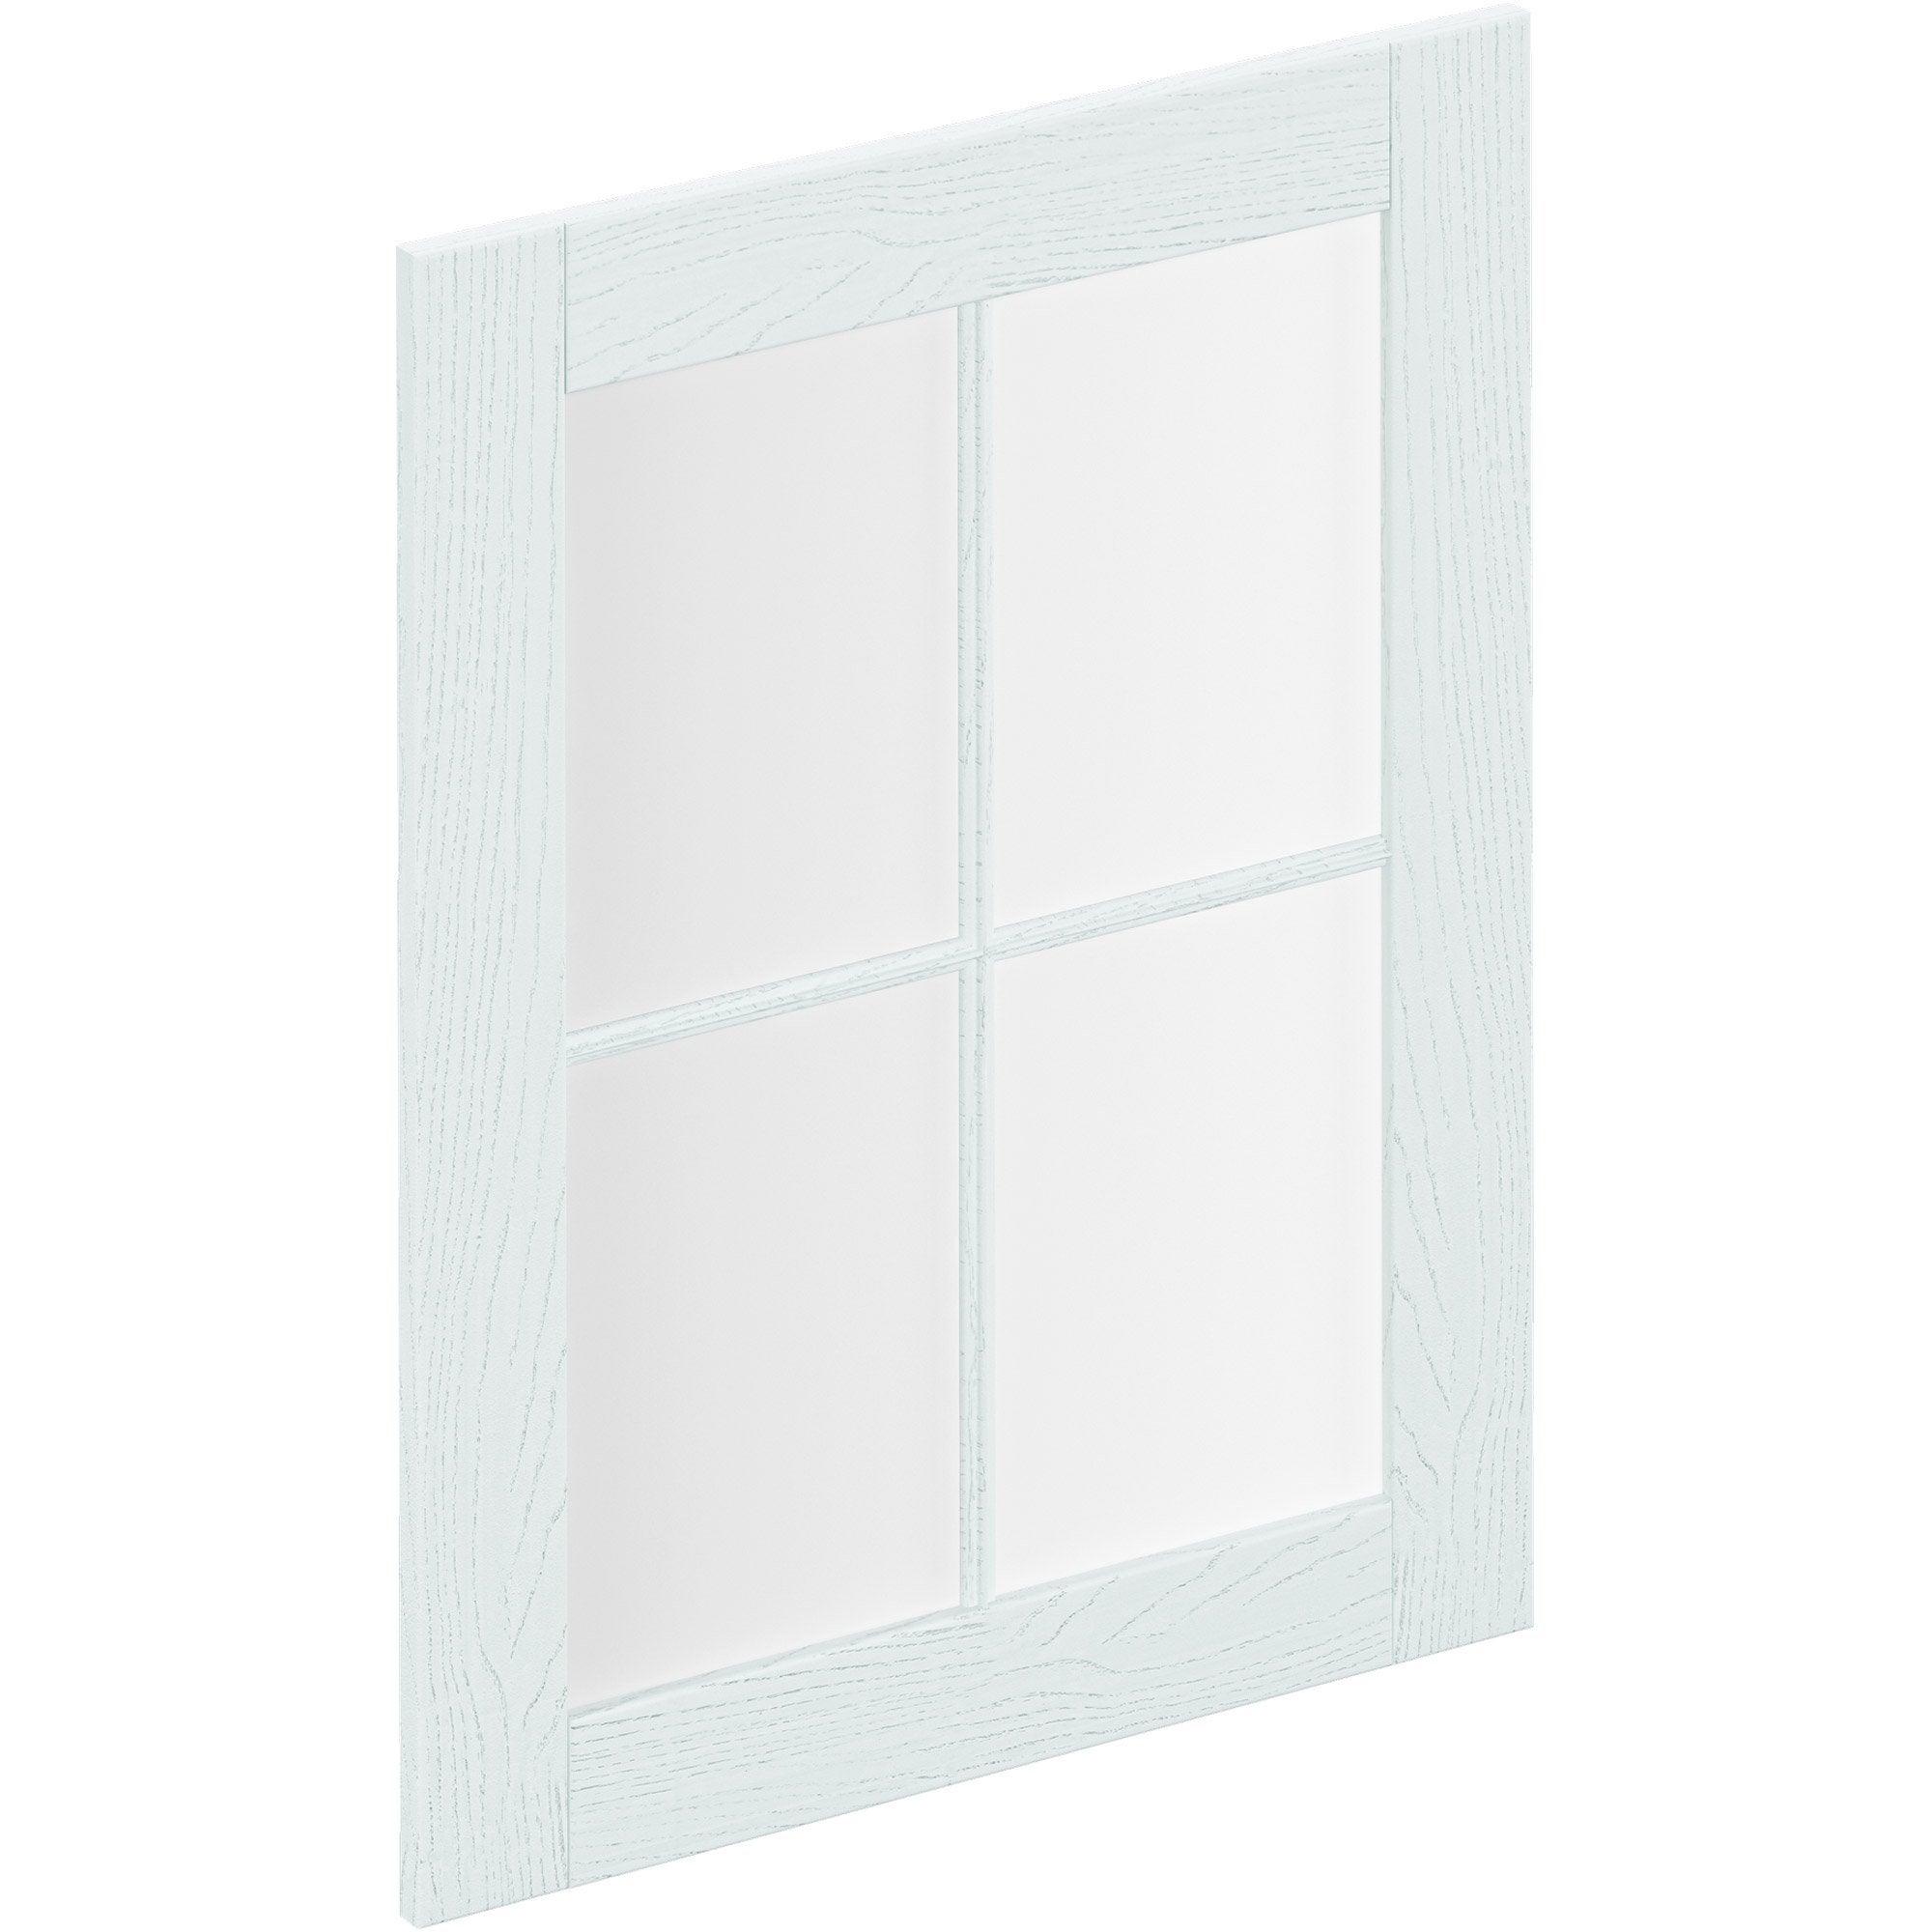 Porte de cuisine vitr e chicago gris clair delinia id x cm leroy merlin - Porte de cuisine vitree ...